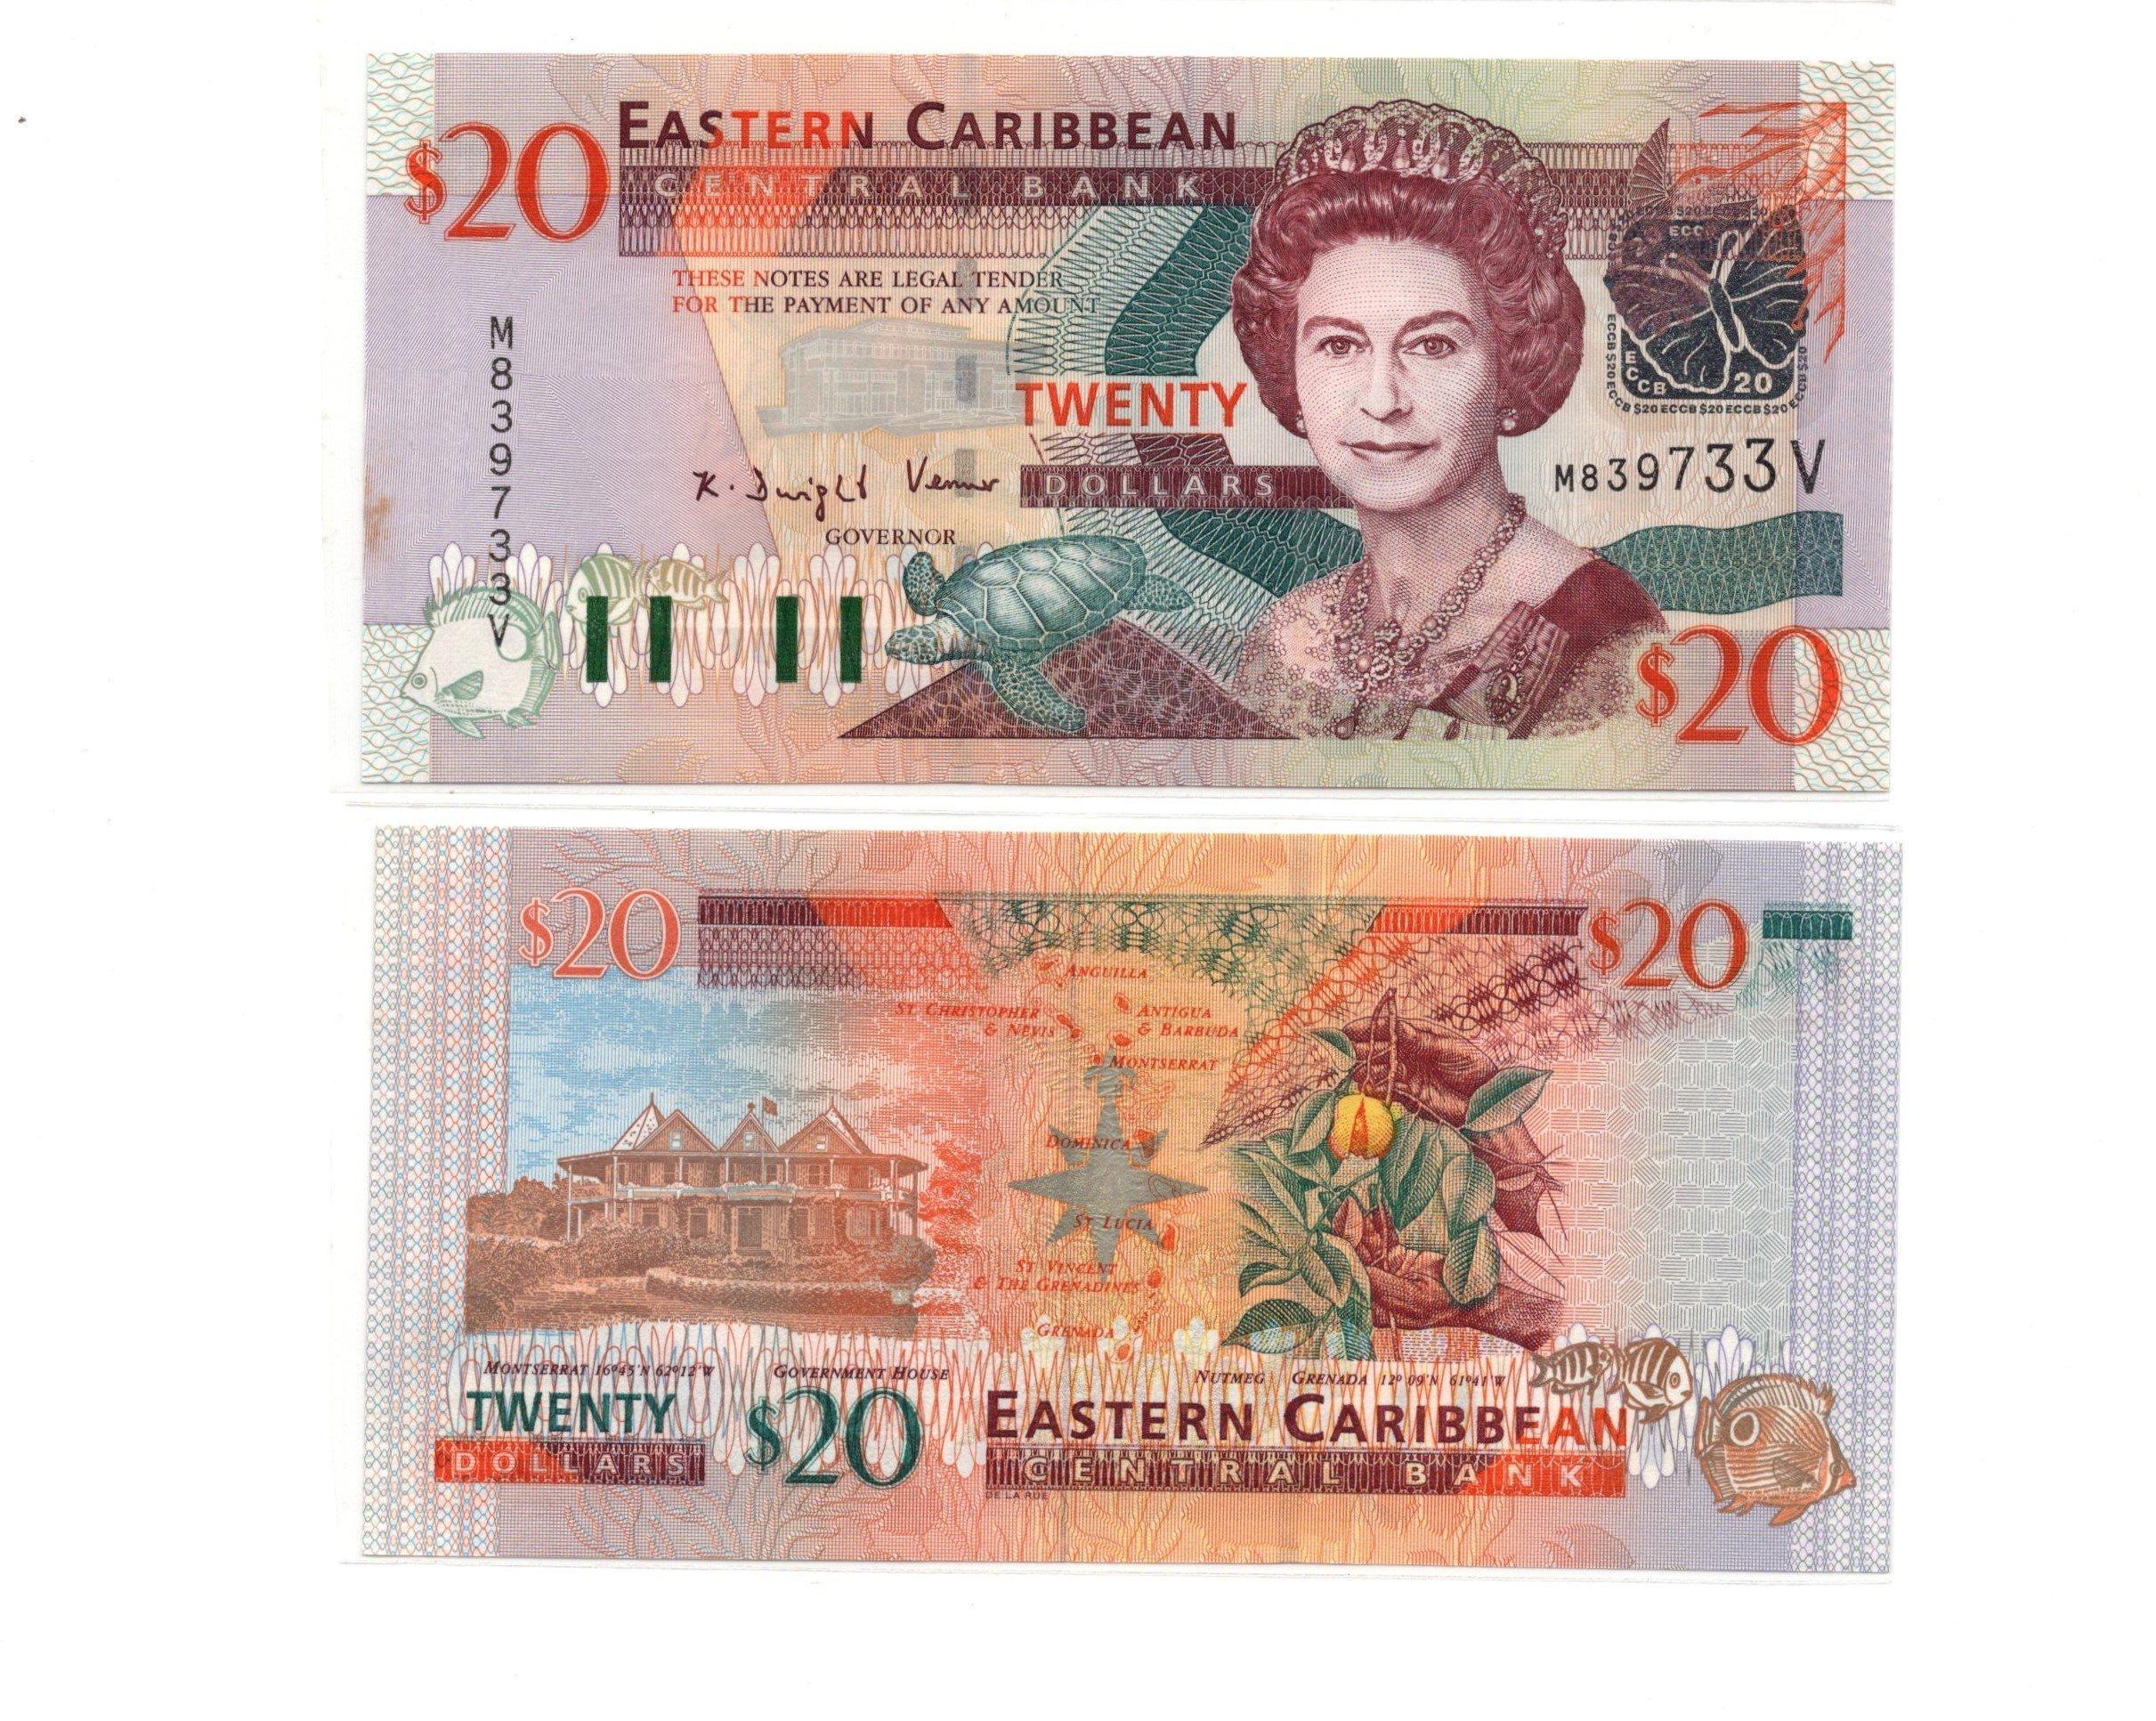 Eastern caribbean 20 dollars